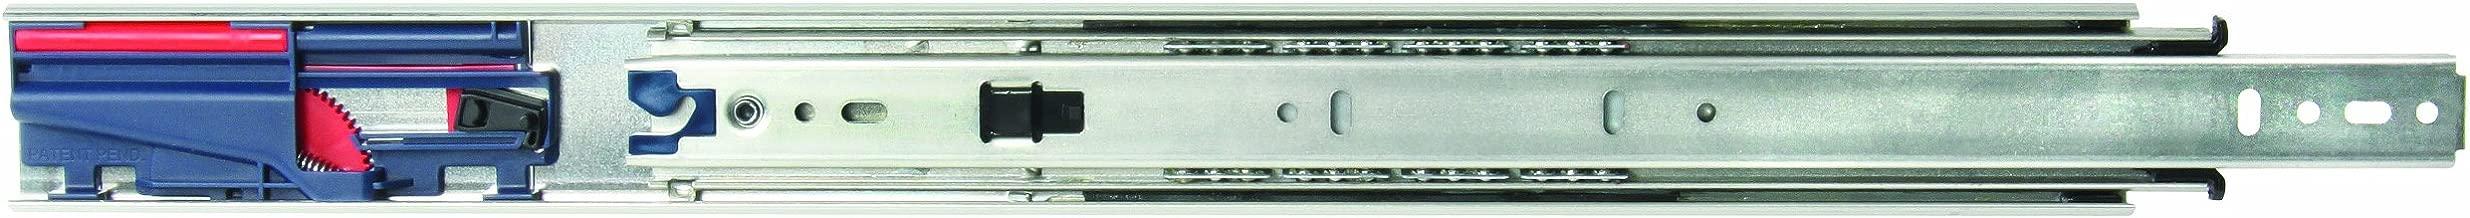 Best kv drawer hardware Reviews